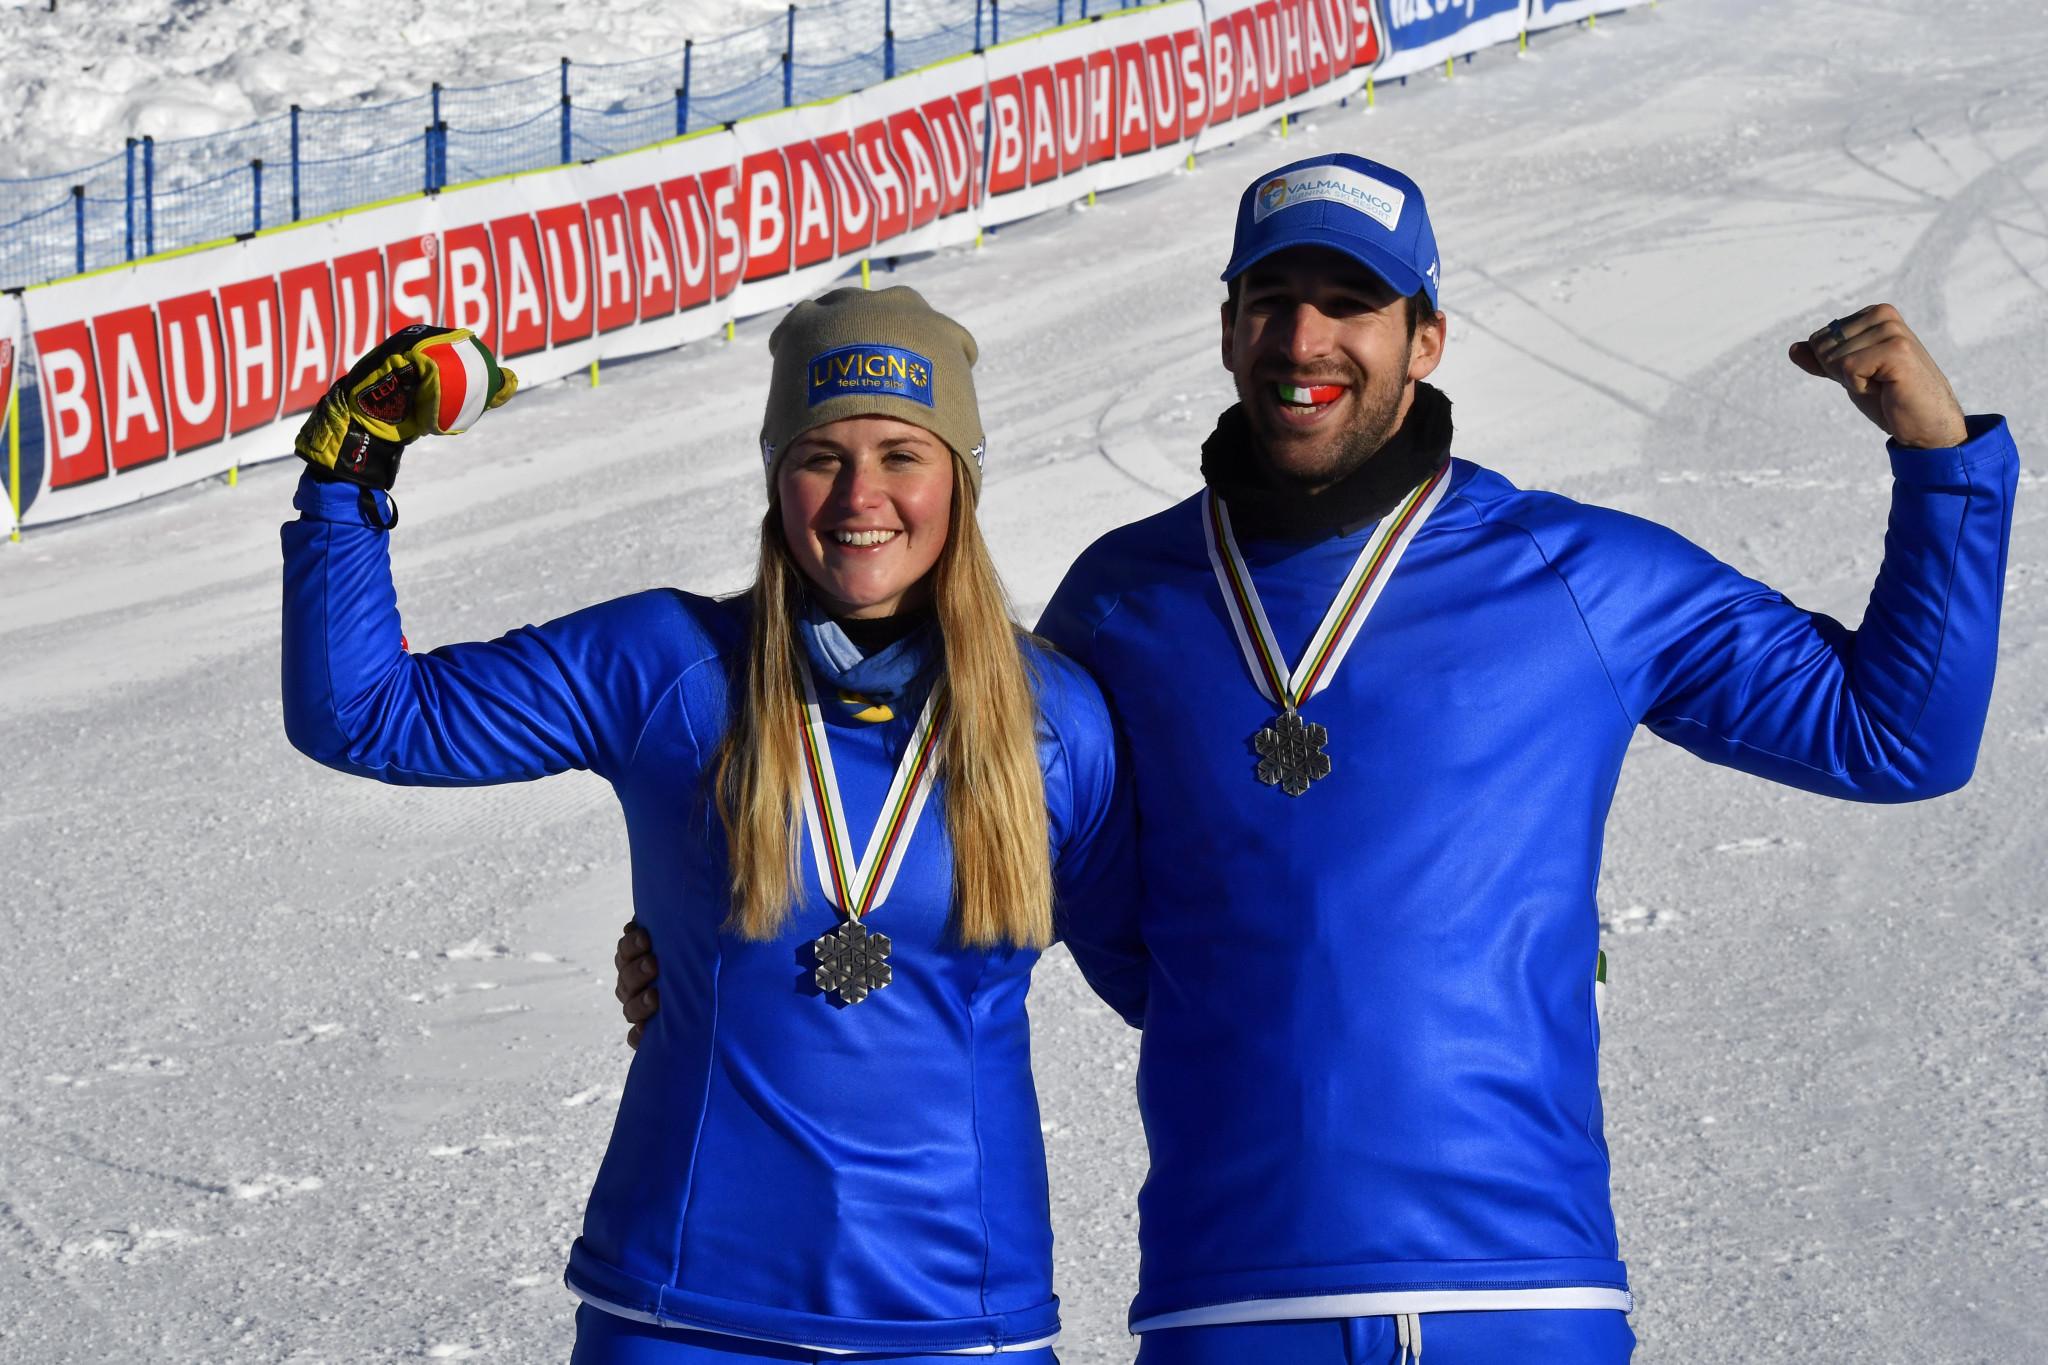 Italians hit ground running at Snowboard Cross World Cup in Austria